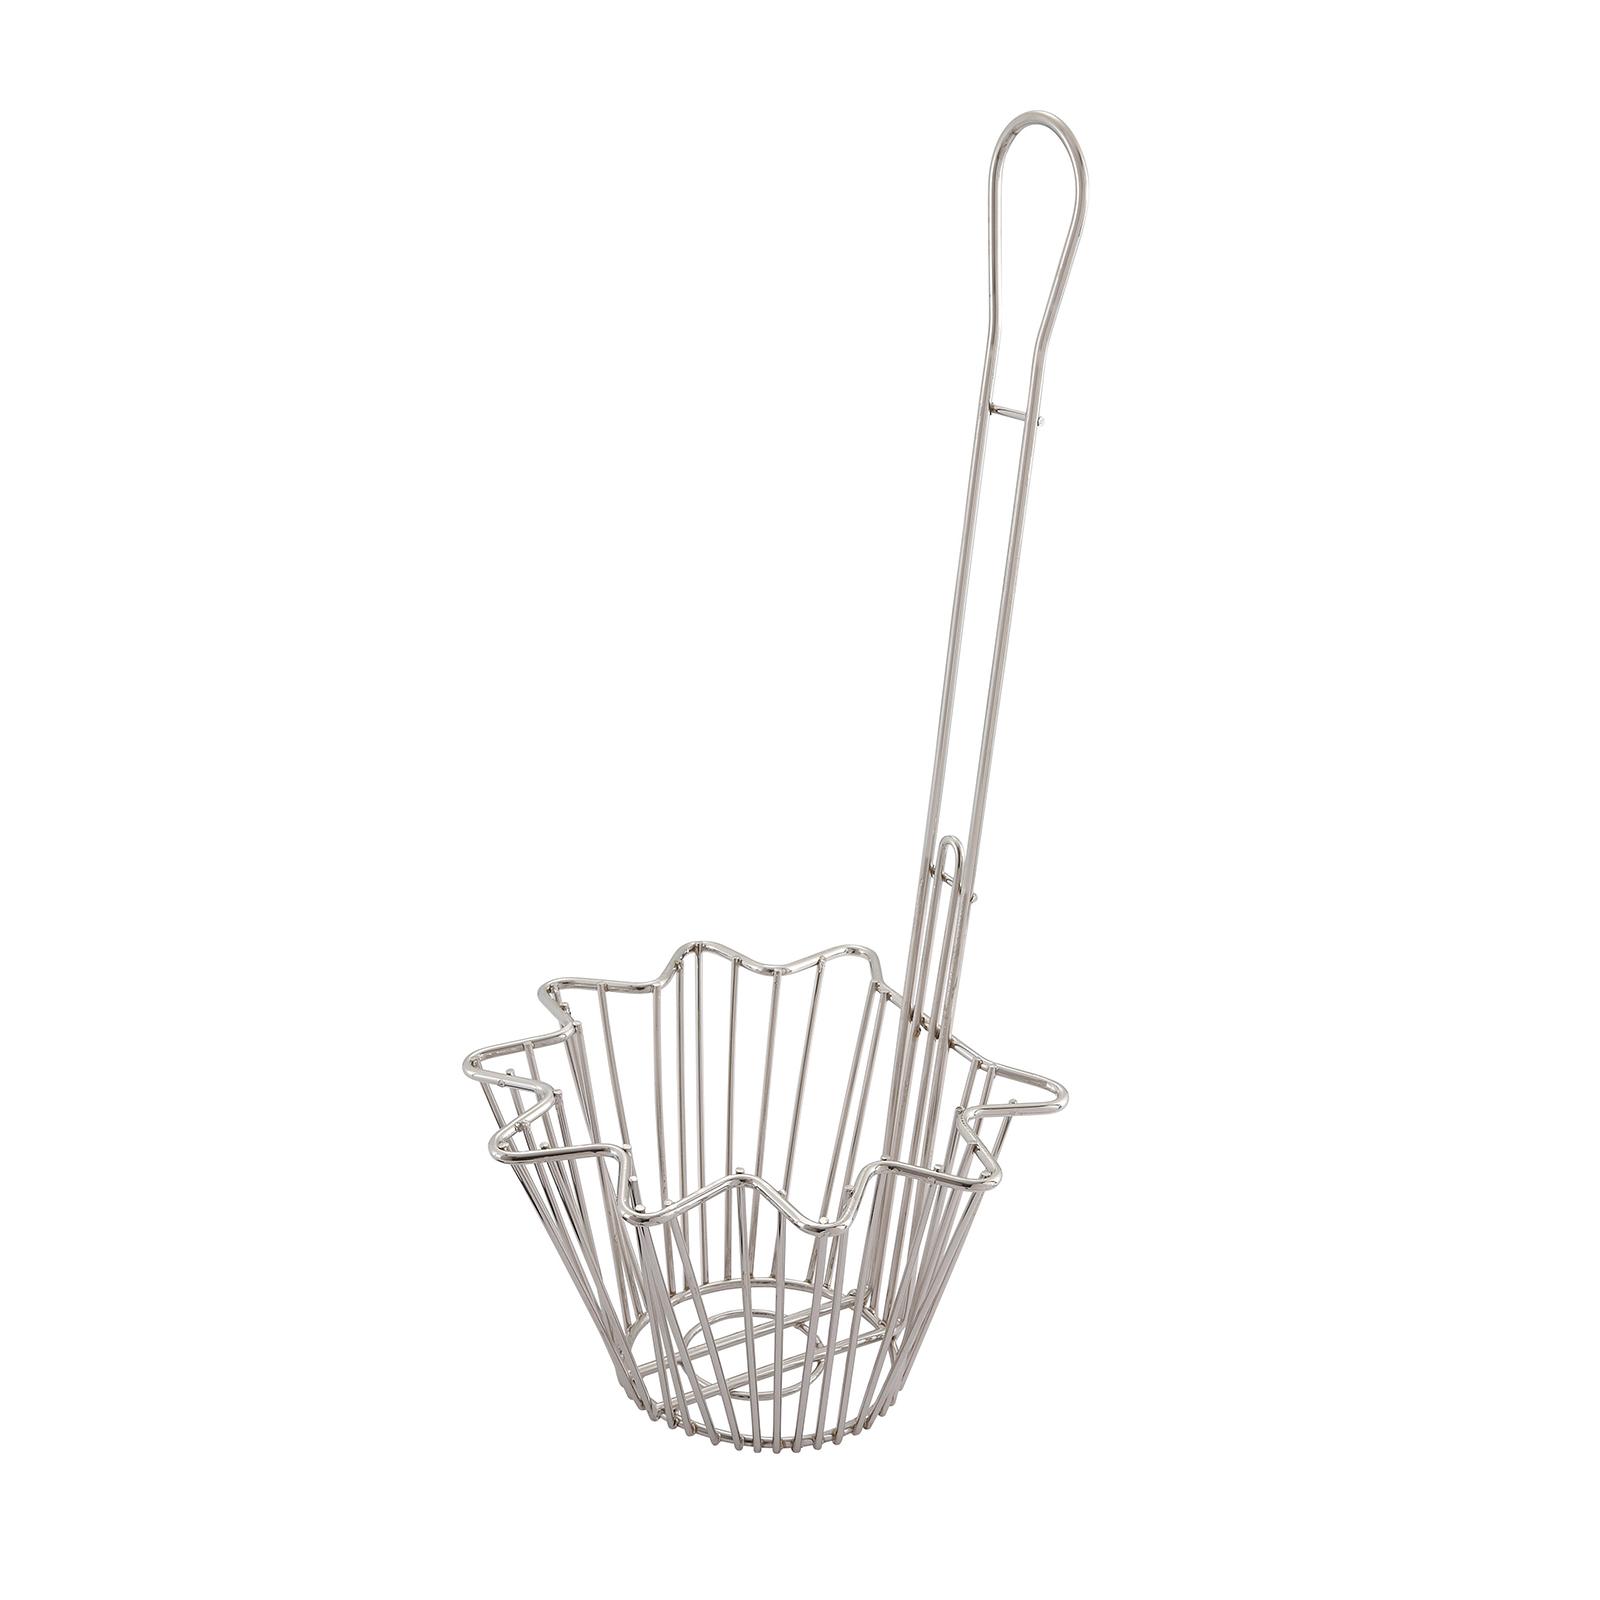 1600-36 Winco TB-20 fryer basket